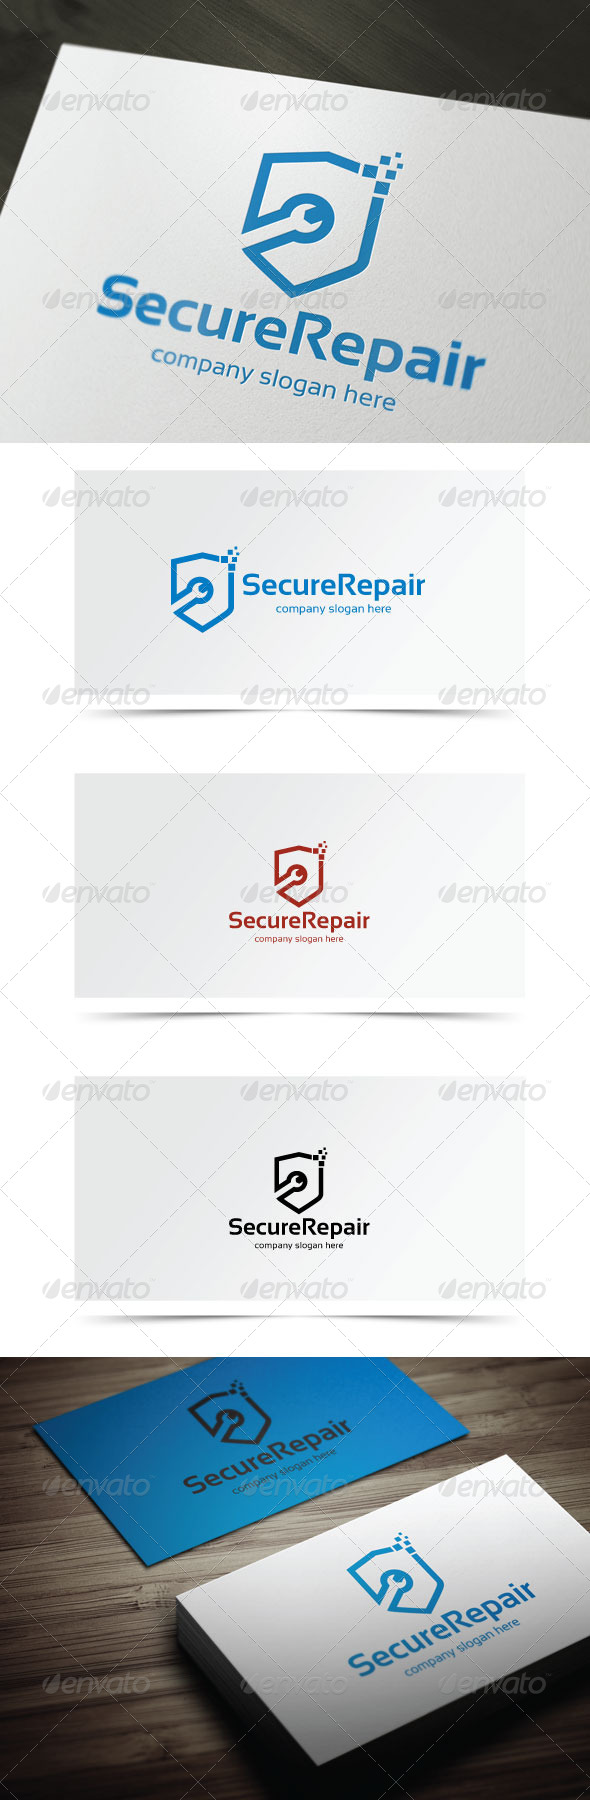 GraphicRiver Secure Repair 6674090